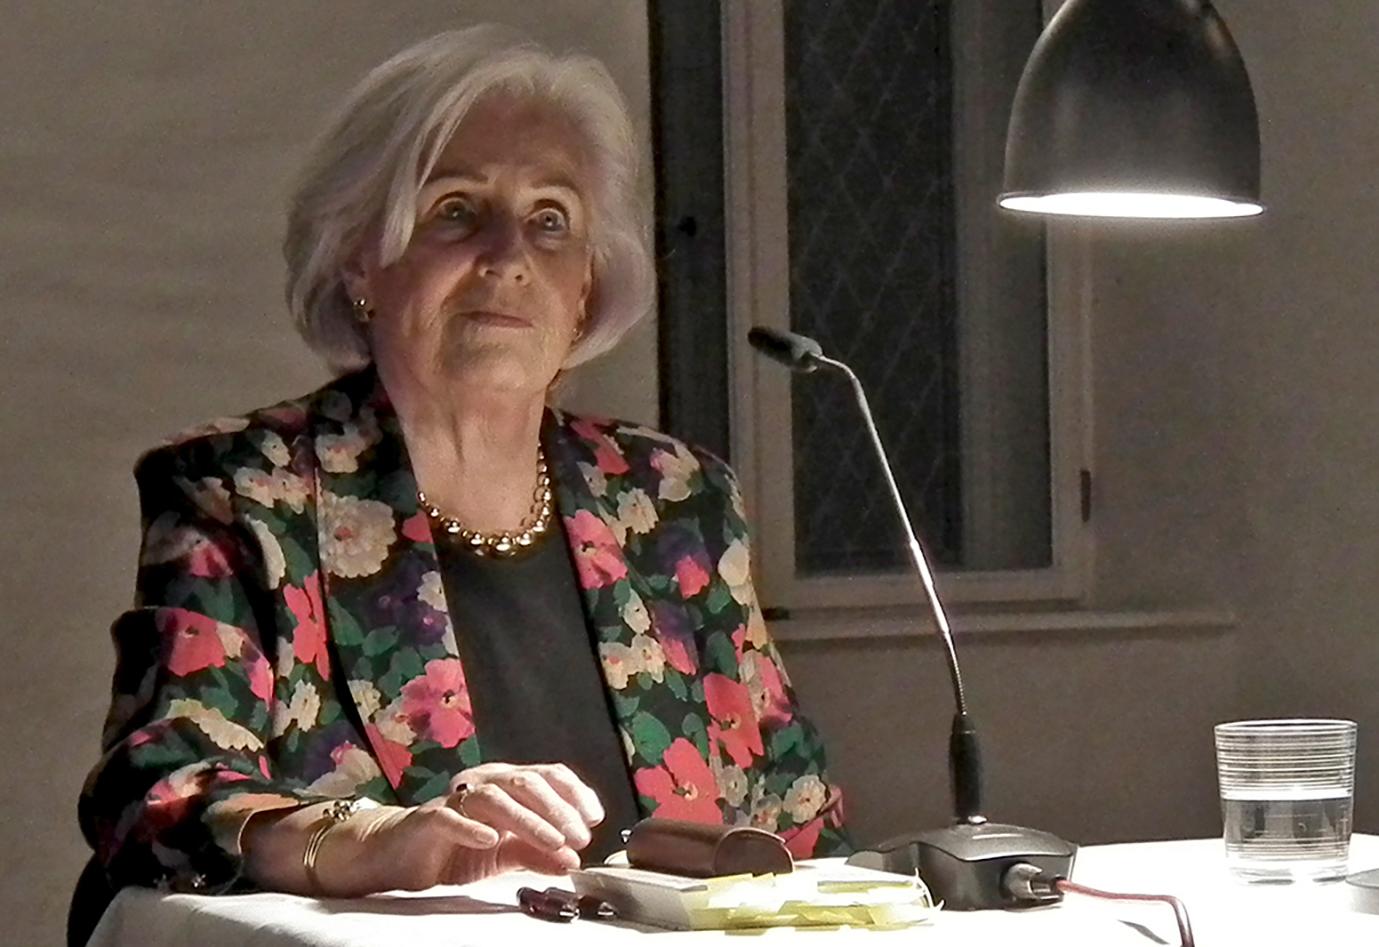 Russensommer – Cornelia Schmalz-Jacobsen erinnert sich